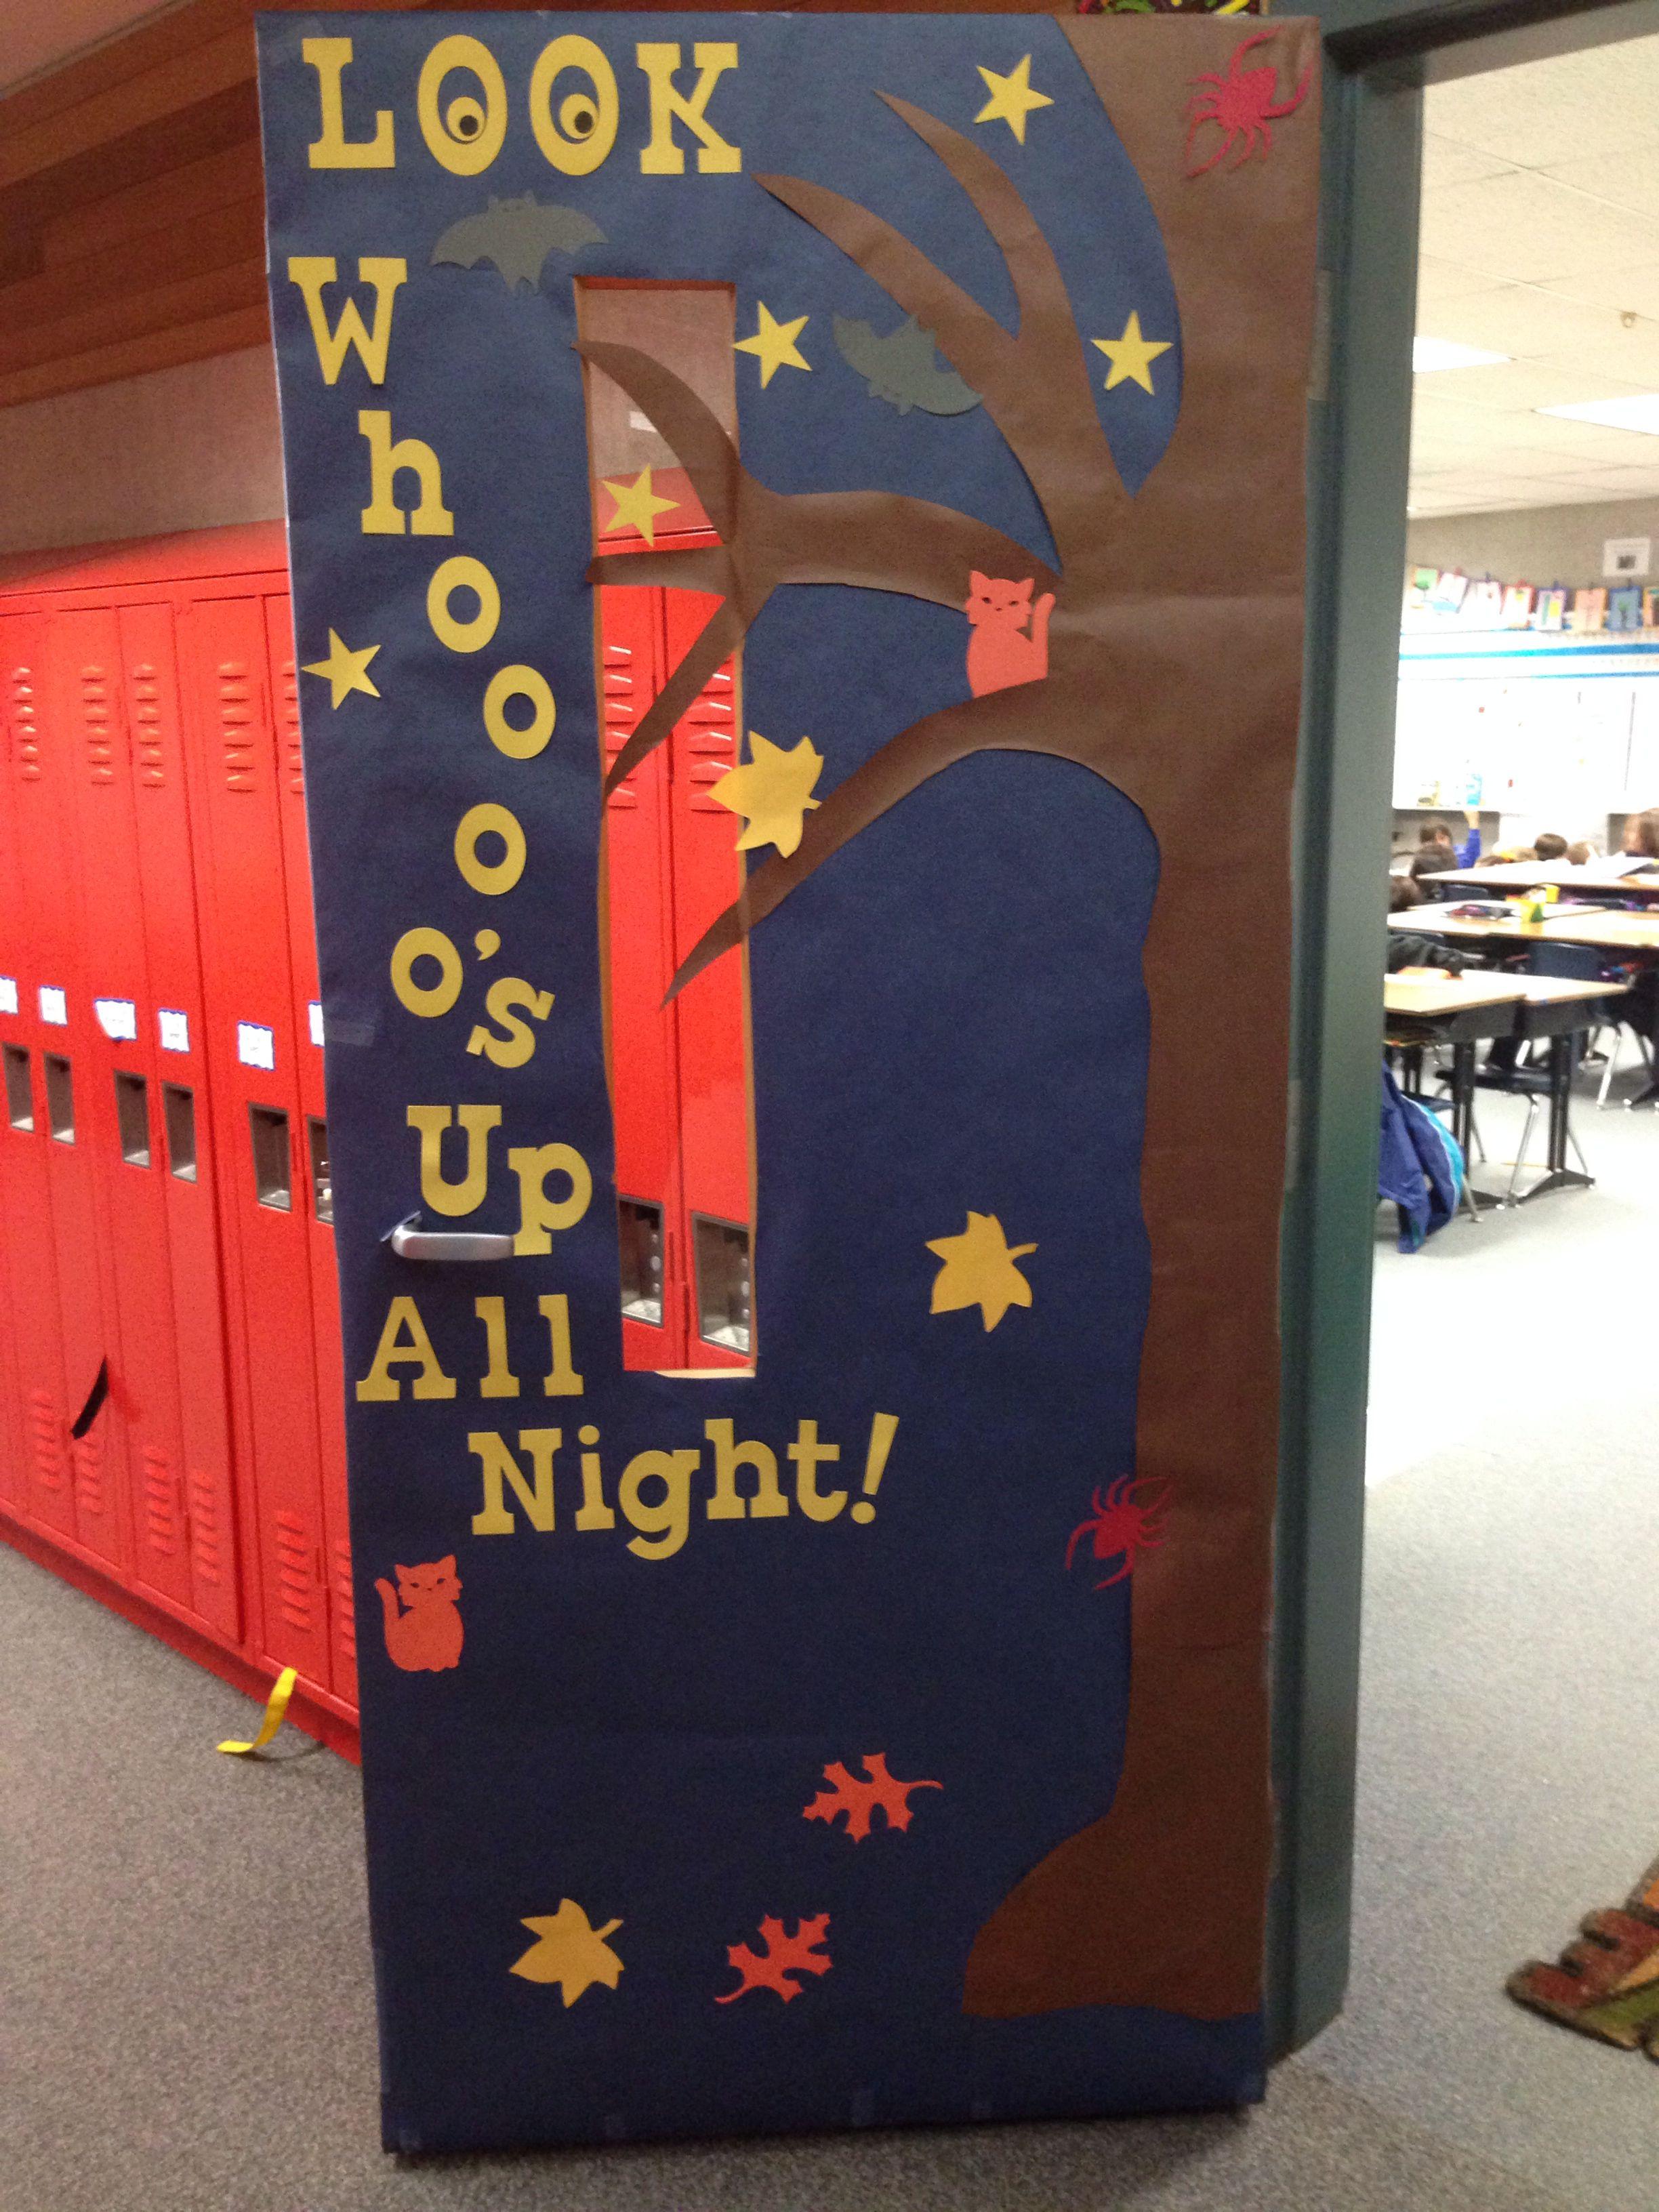 Classroom Door Design ~ Look whoooo s up all night classroom door design for